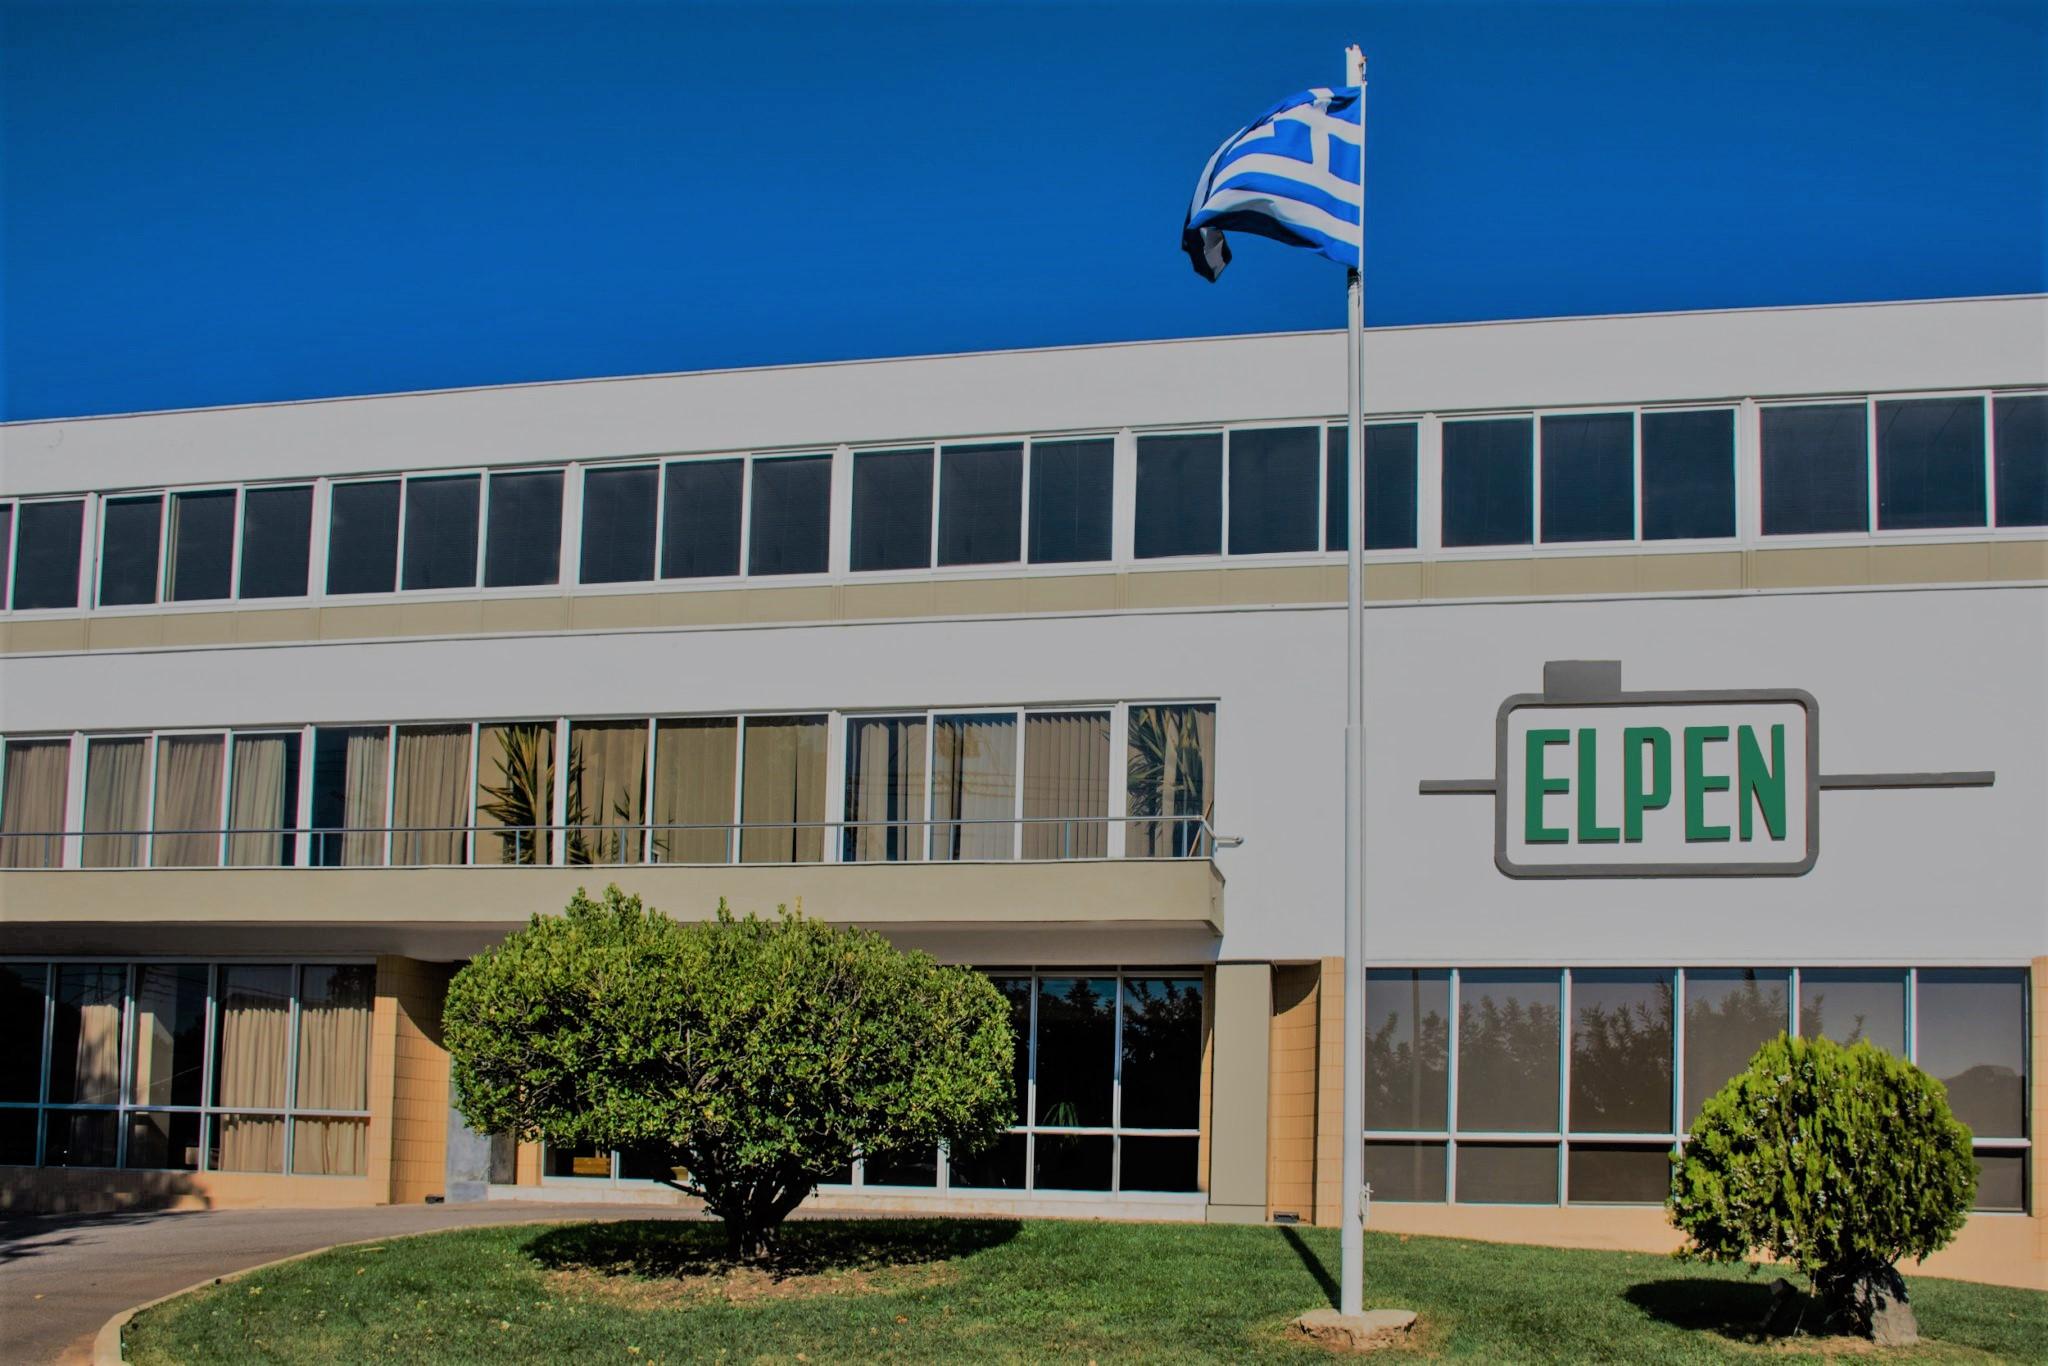 ELPEN : Στηρίζει την κλινική έρευνα για το ισραηλινό φάρμακο κατά της COVID-19